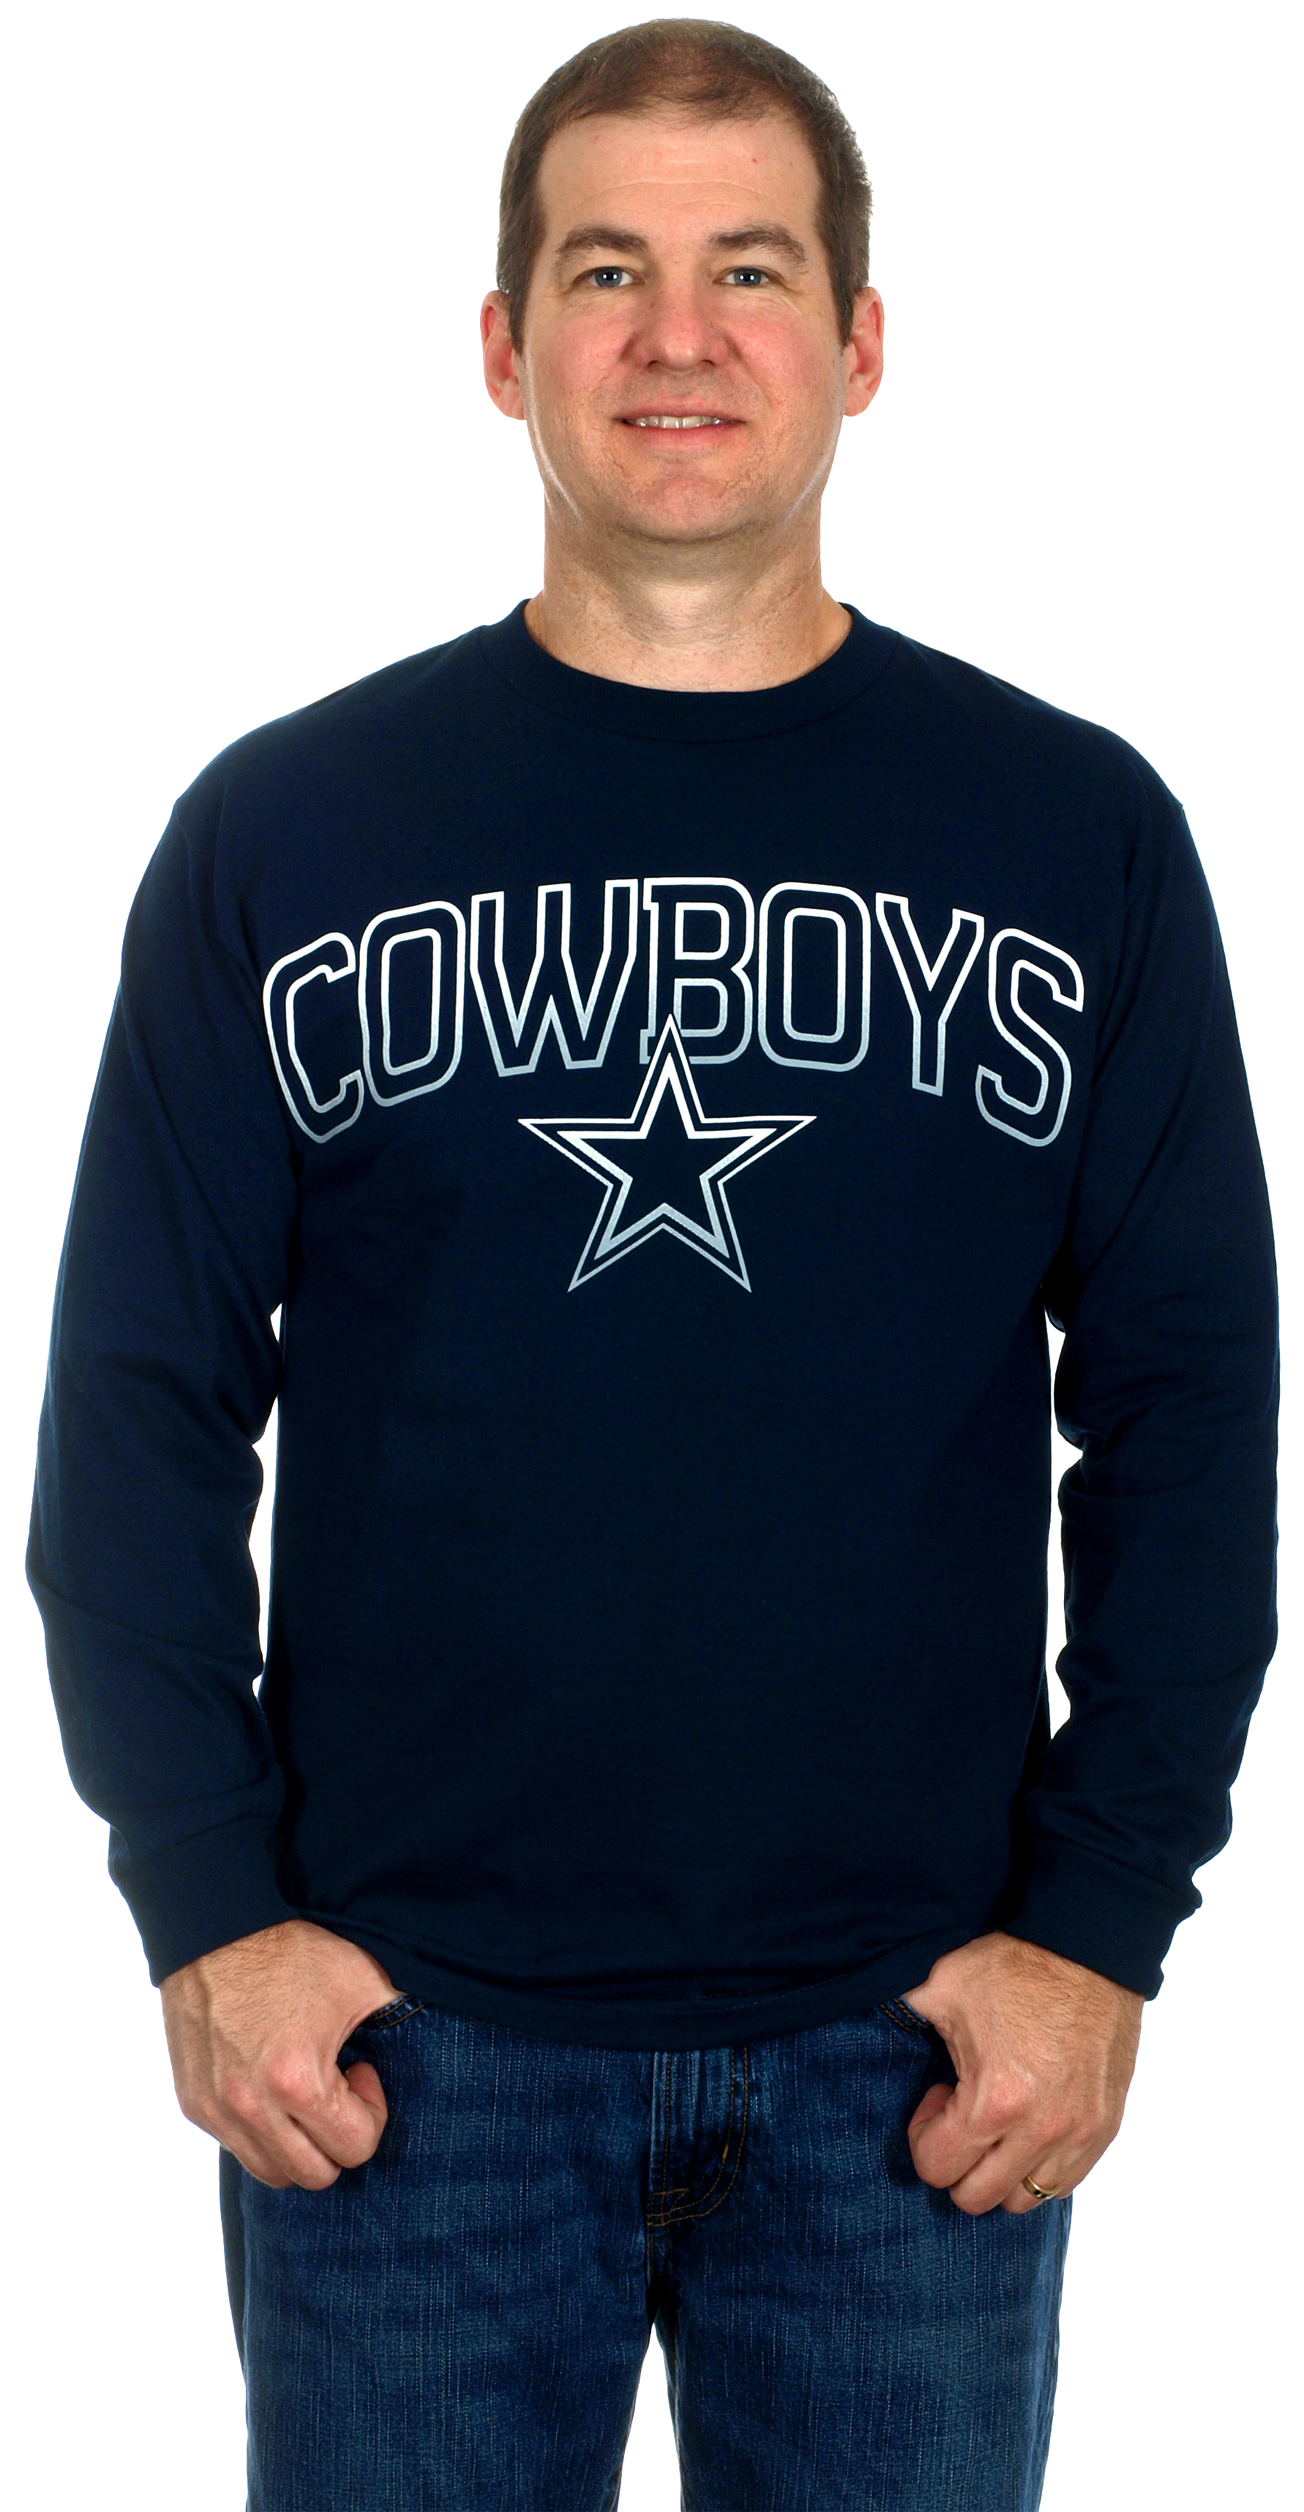 Dallas Cowboys Mens Long Sleeve Cotton T-Shirt by